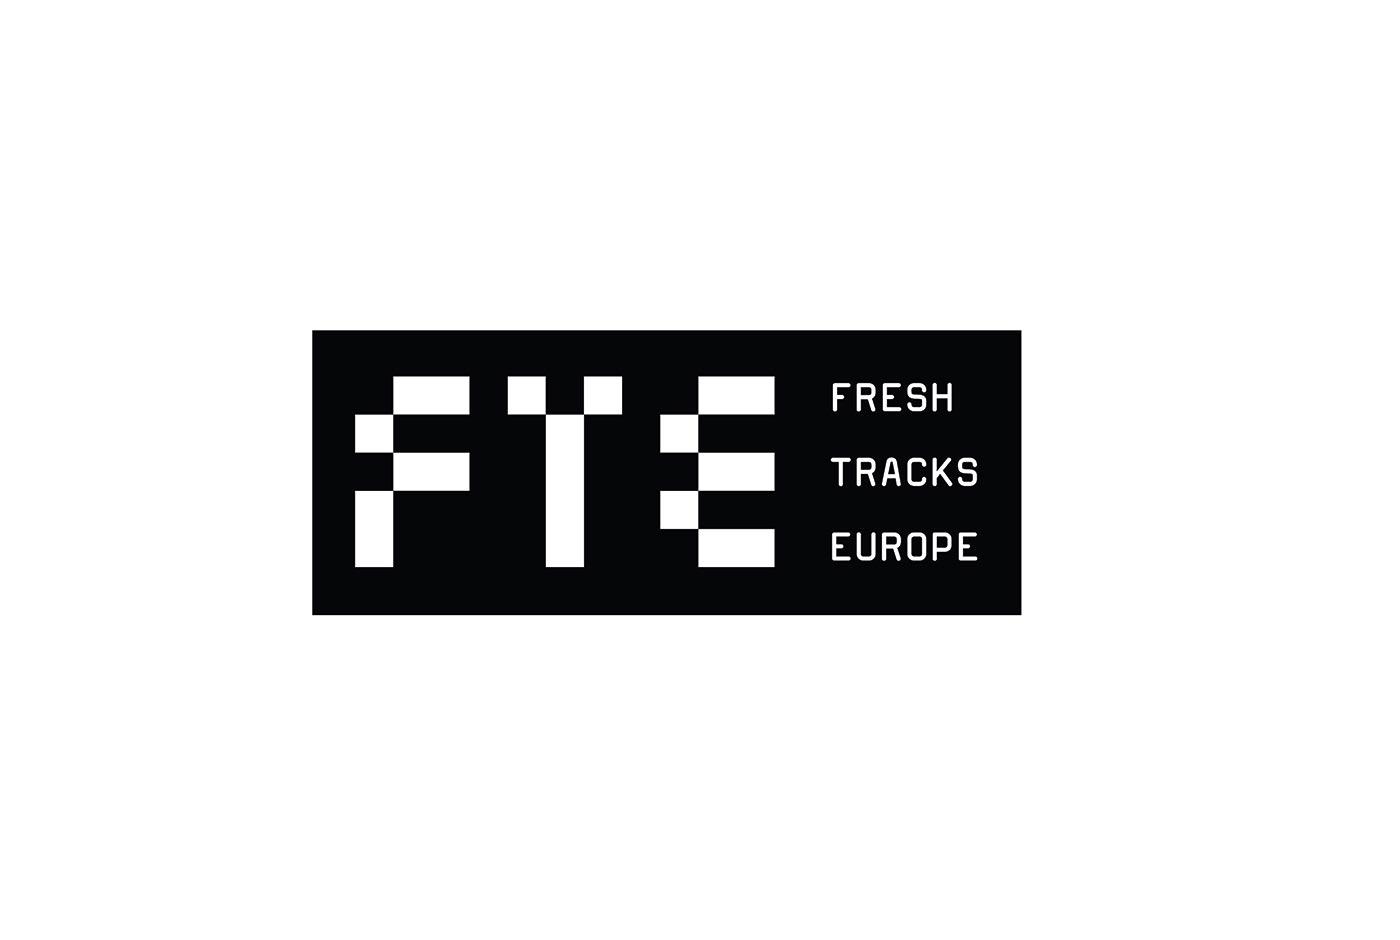 Fresh Tracks Europe Identity